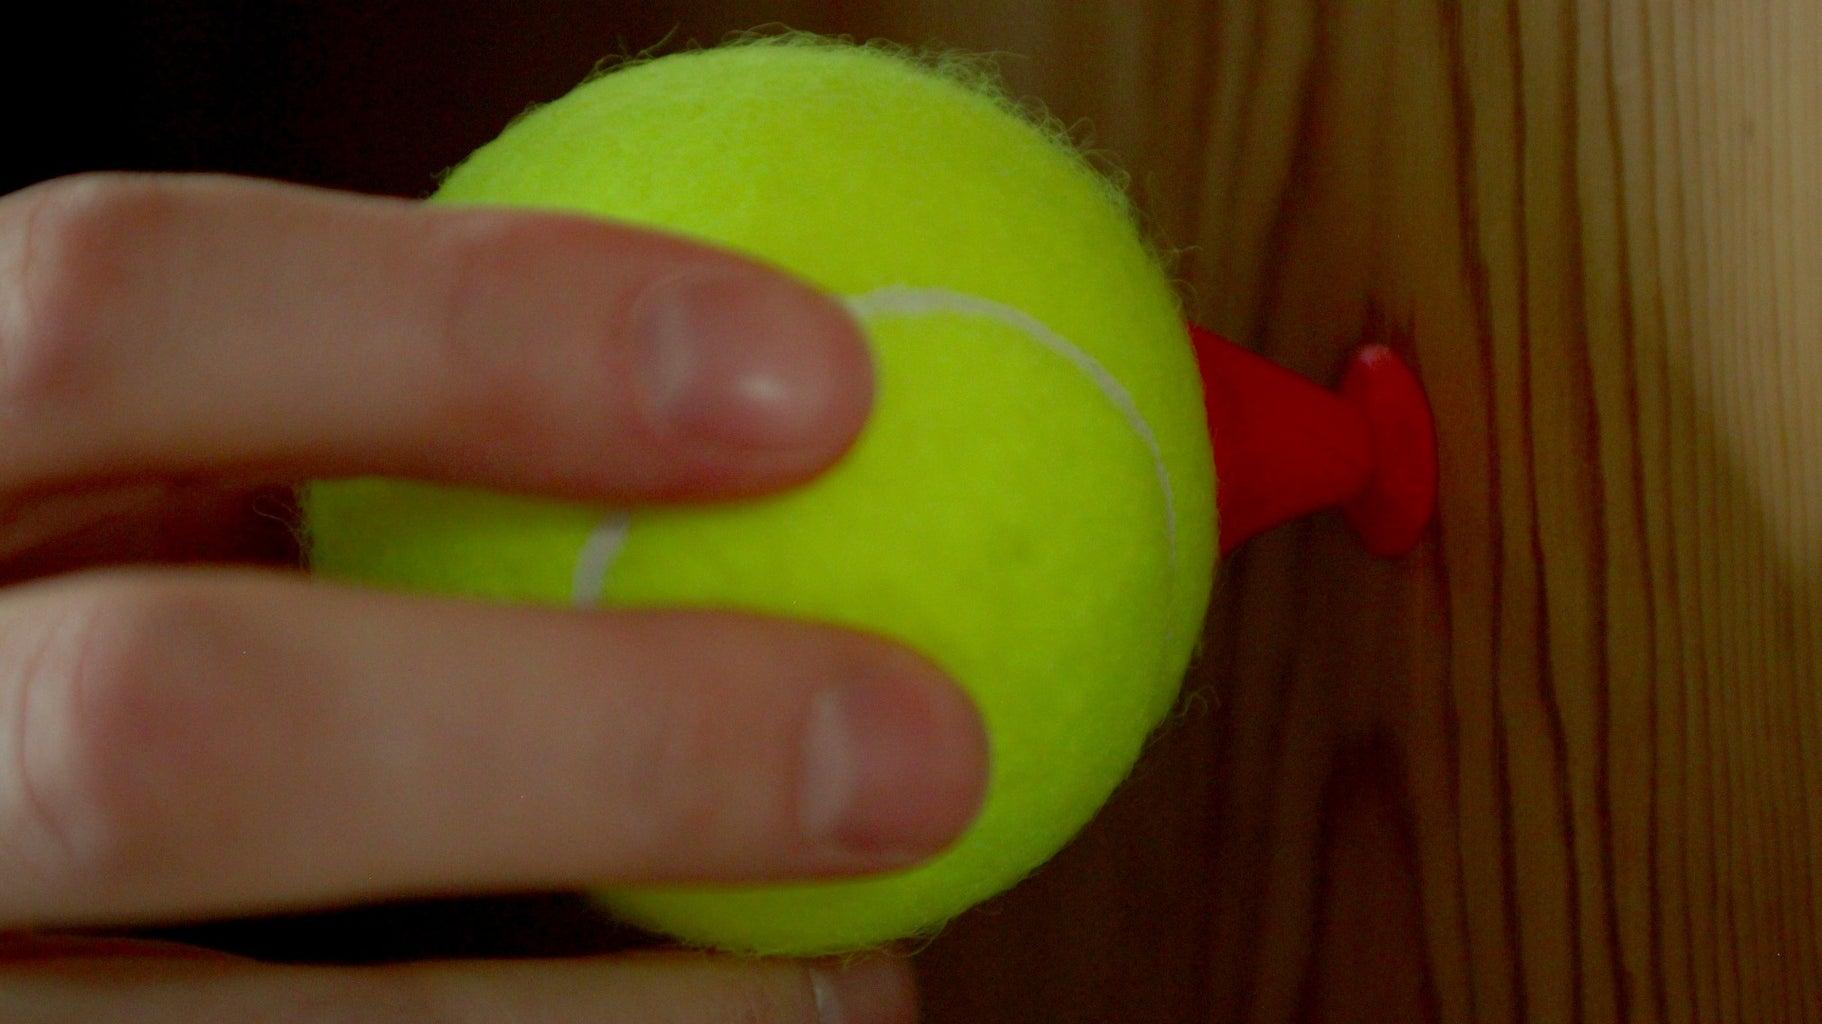 Attaching the Tennis Ball